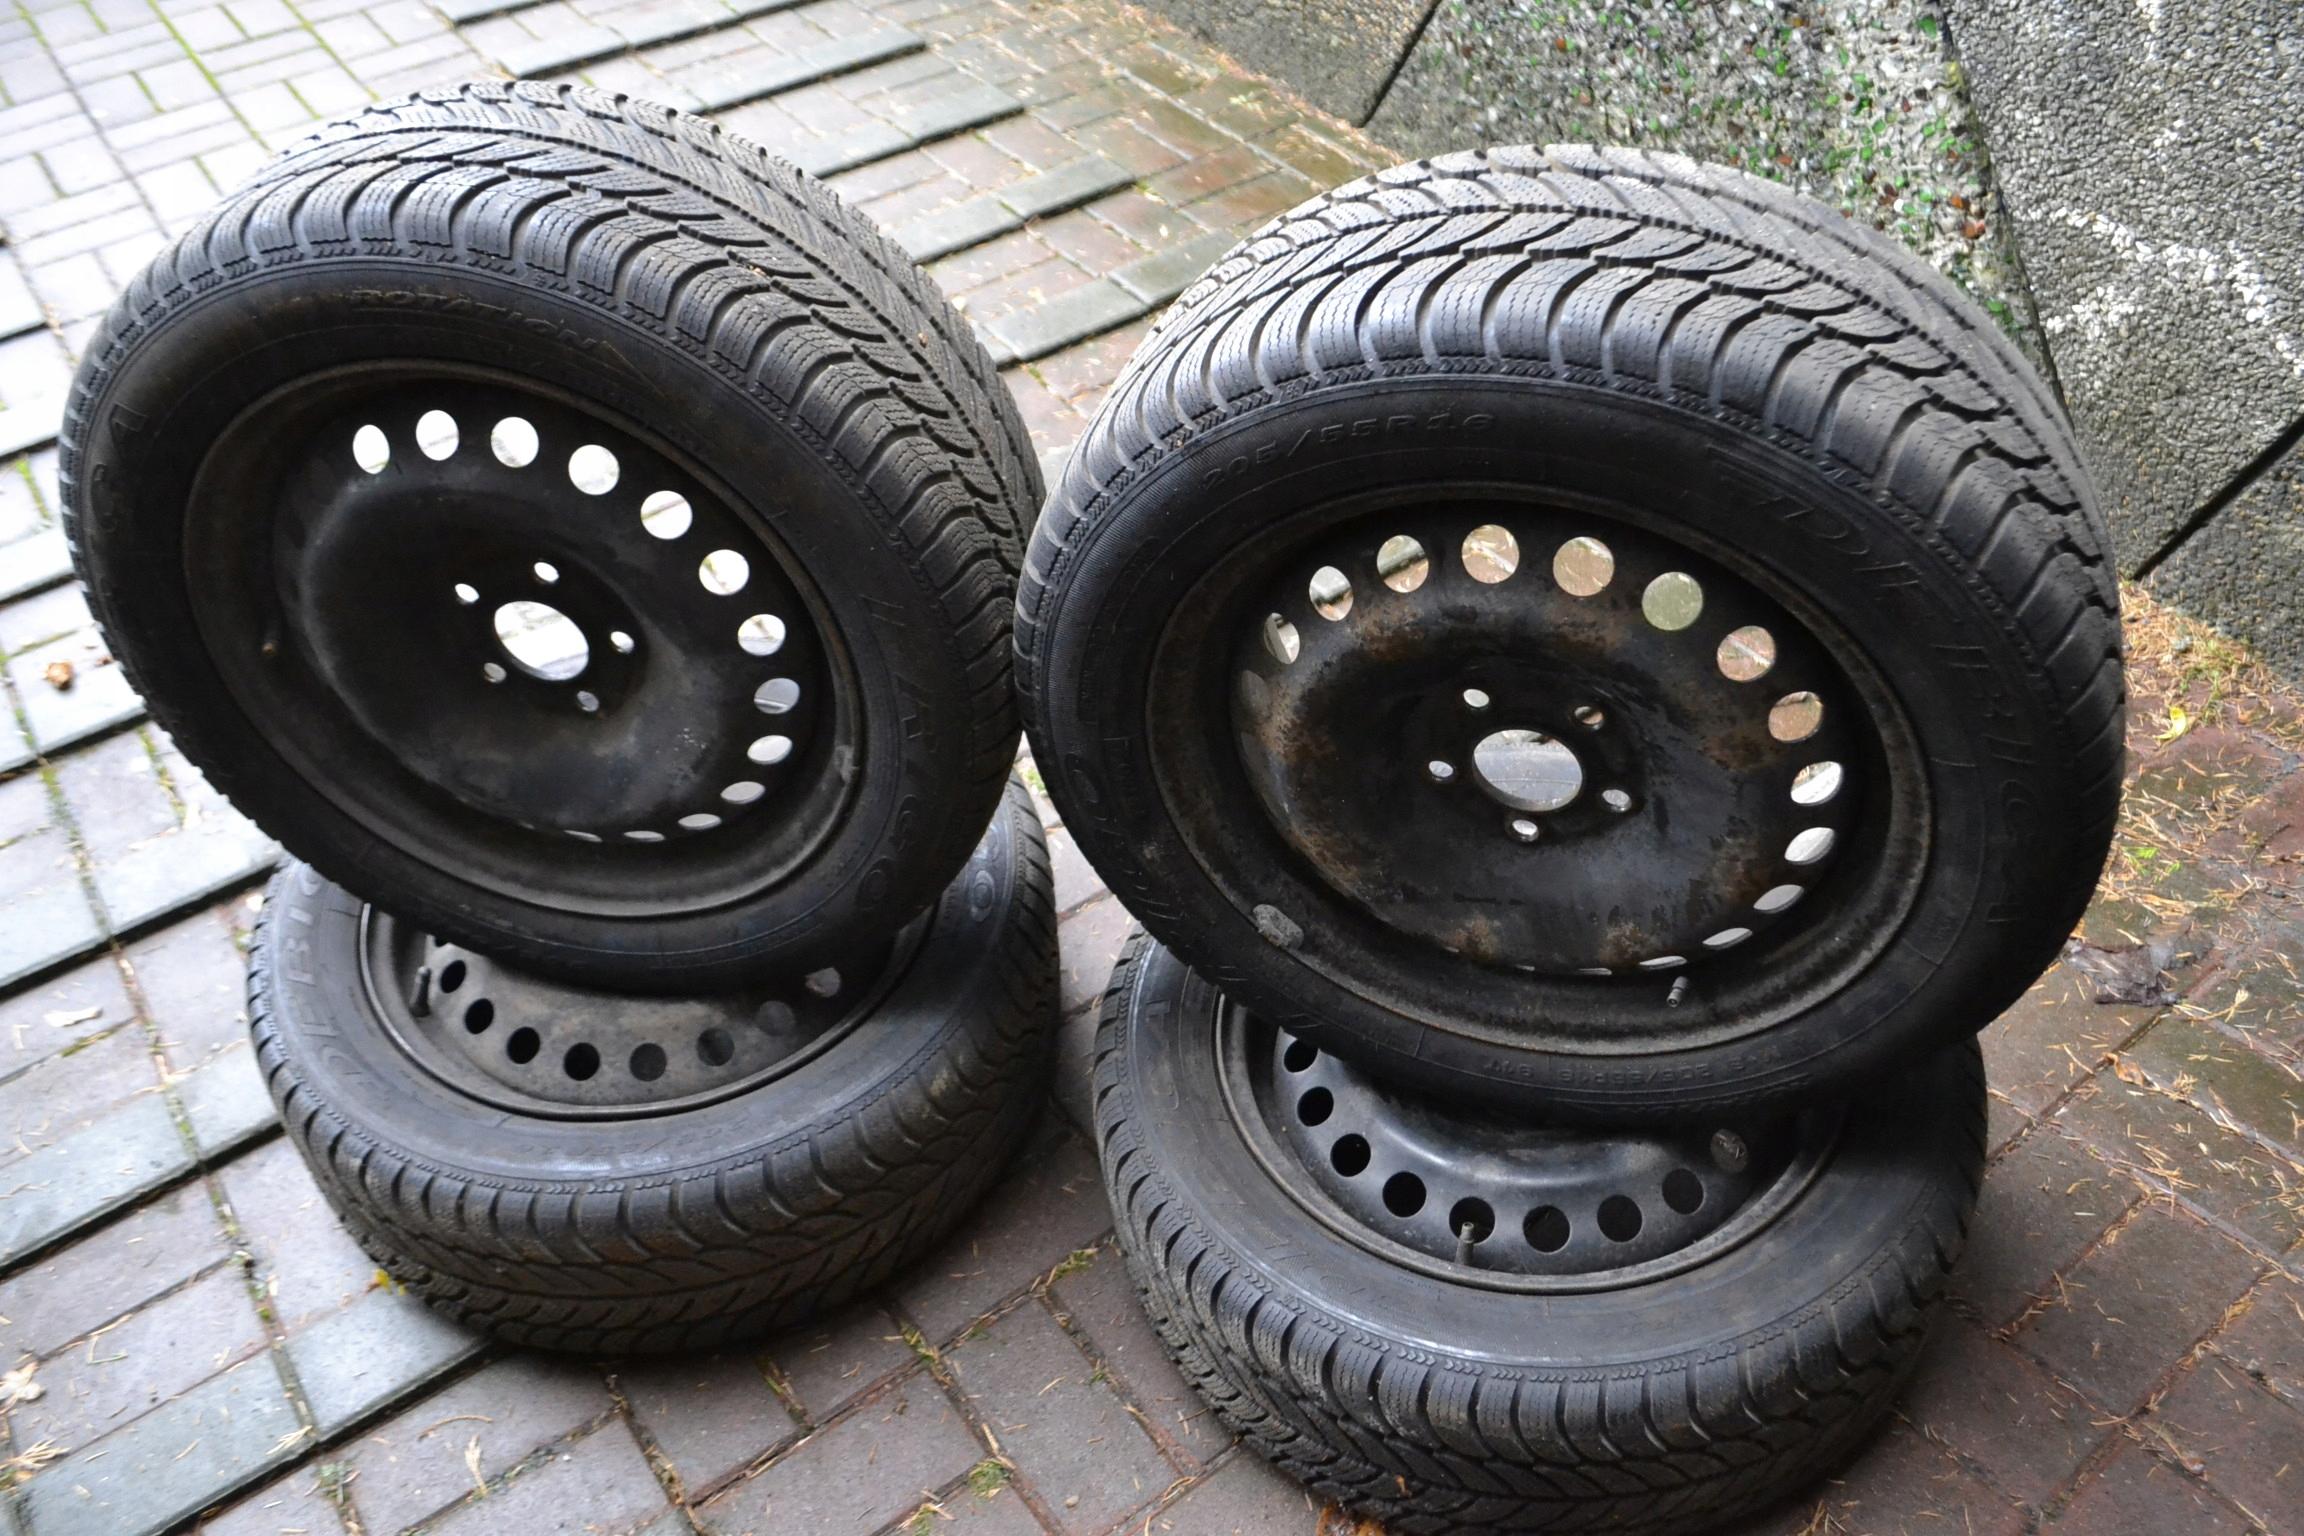 Felgi Opony Zimowe Ford Mondeo Mk3 20555 R16 7652672453